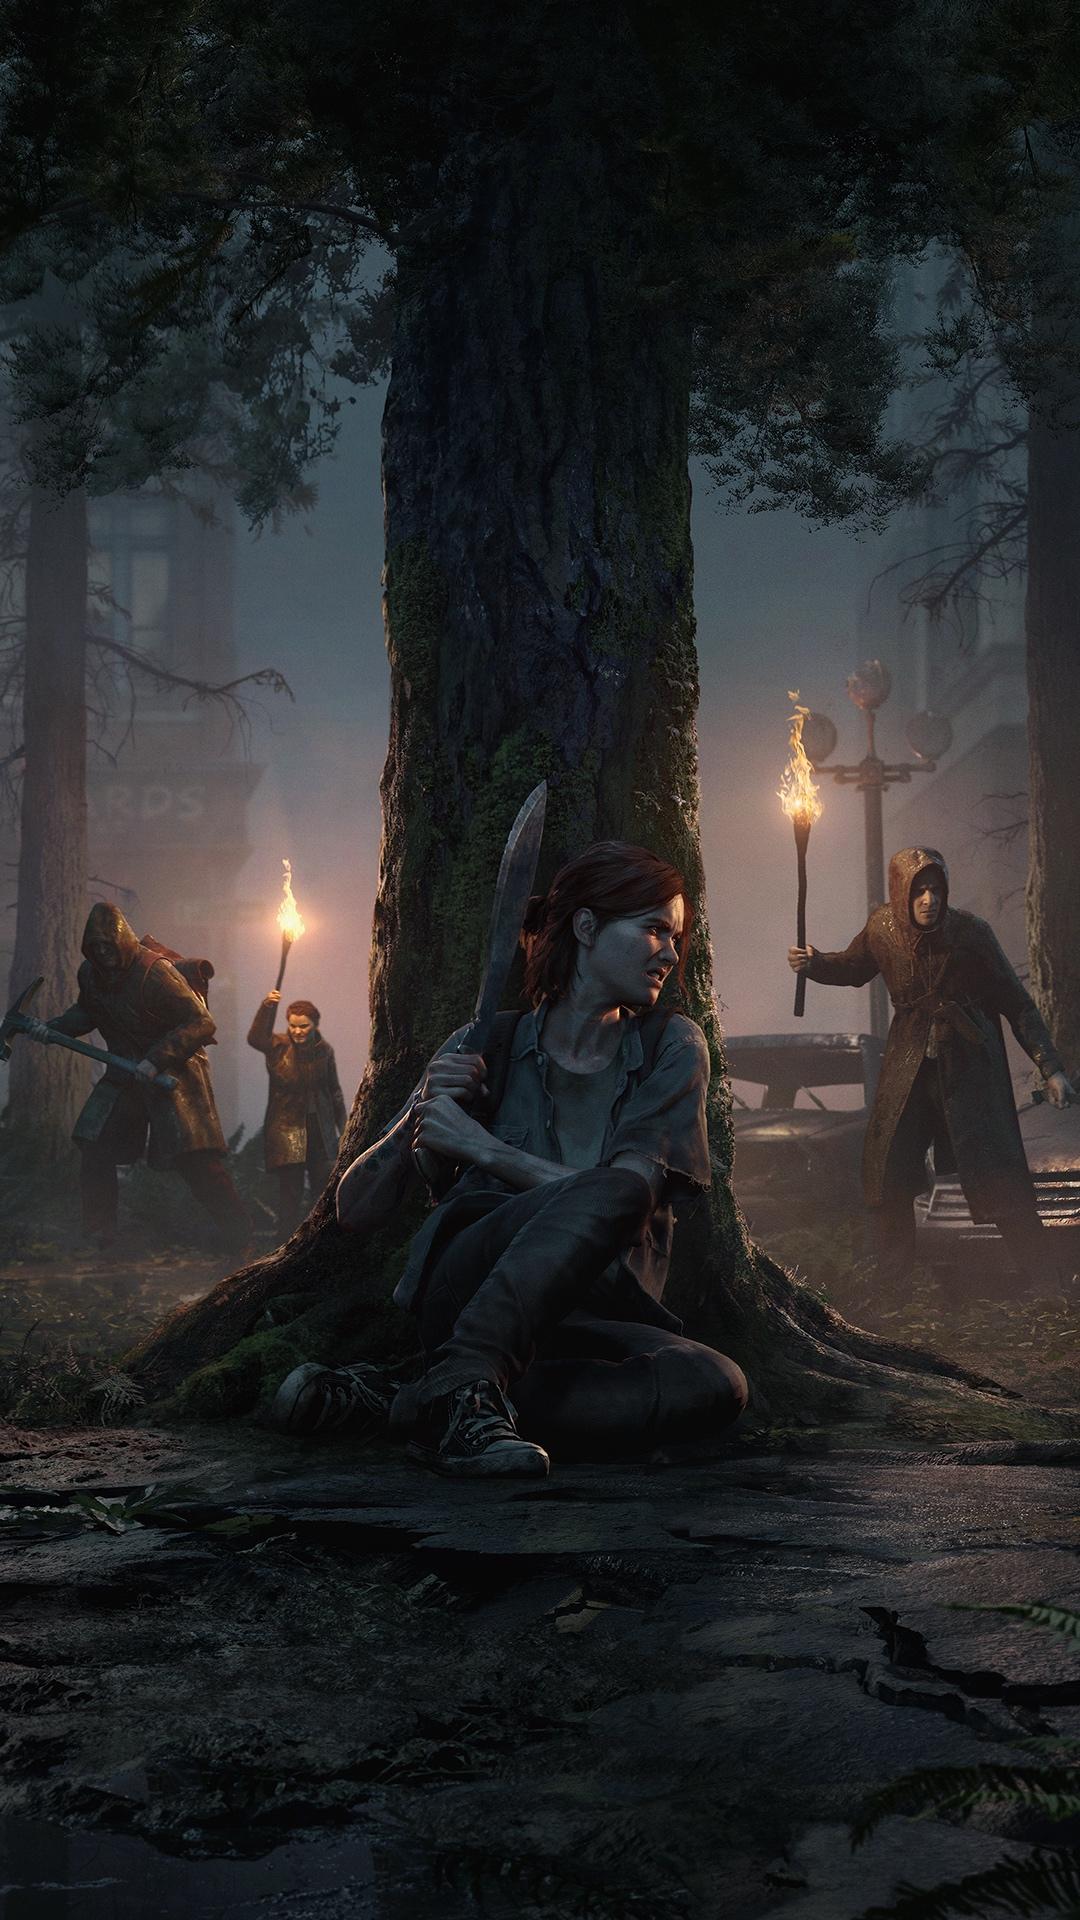 The Last of Us Part 2 Mobile Wallpaper   Album on Imgur 1080x1920